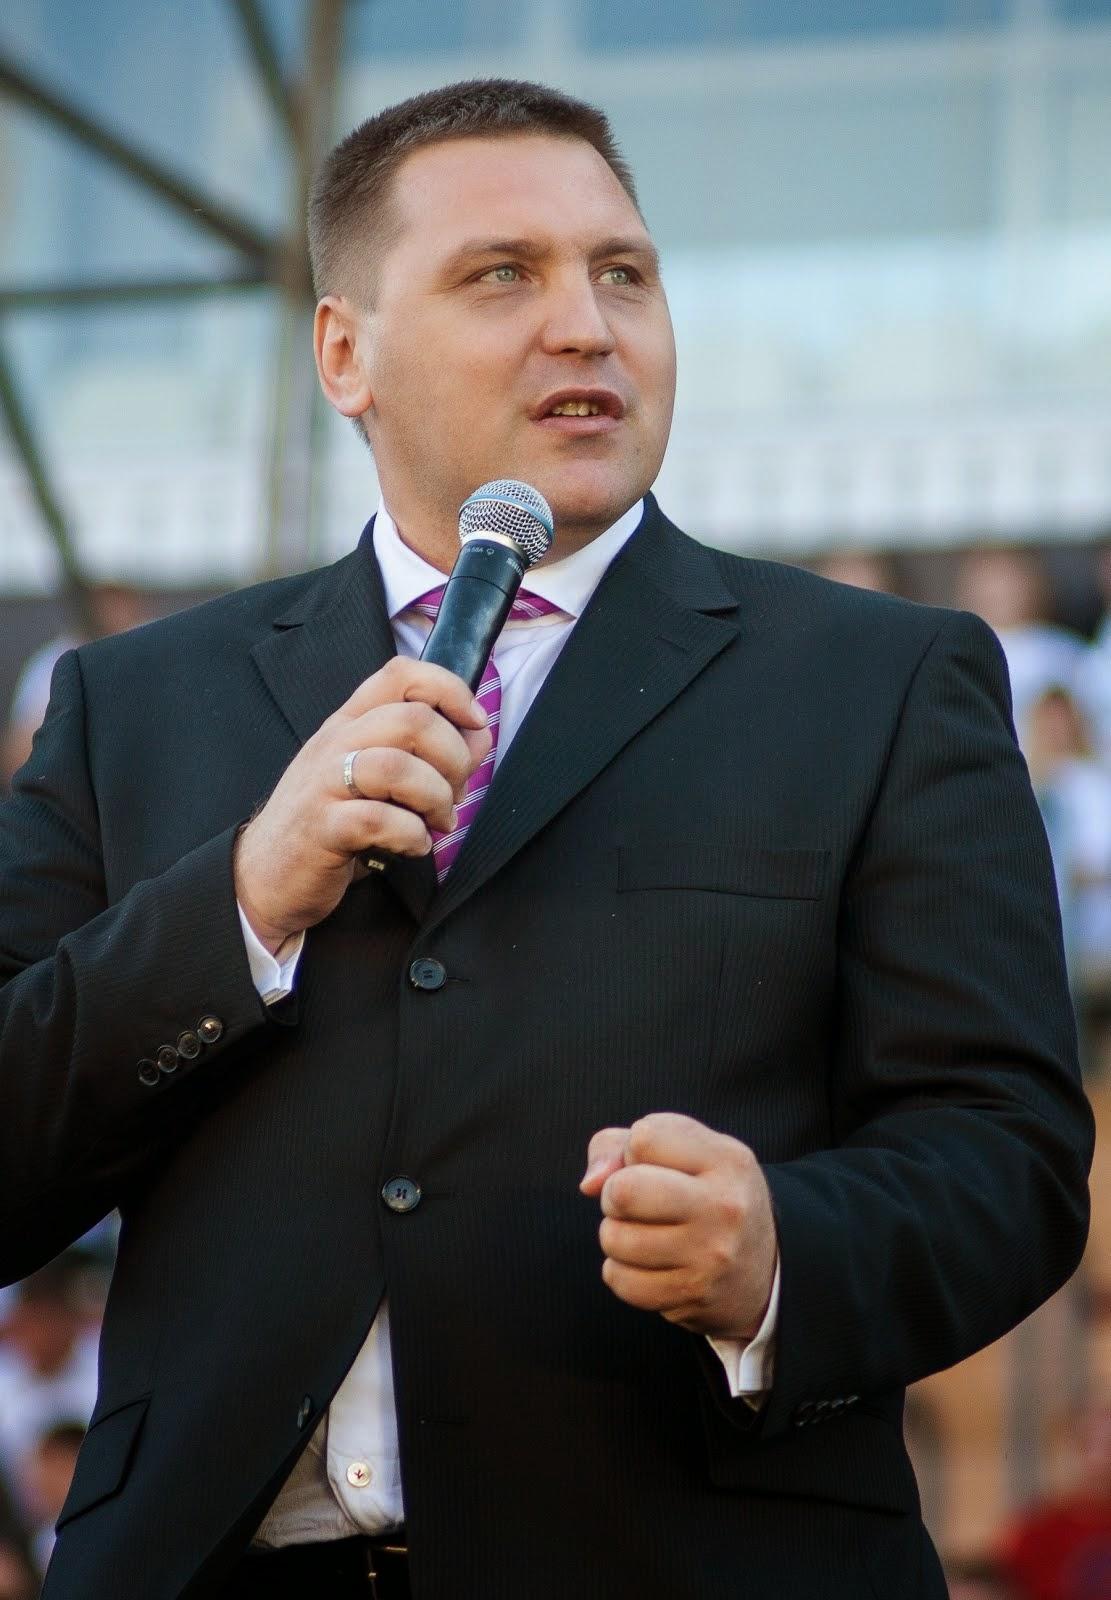 Пастор-евангелист     Дмитрий Макаренко